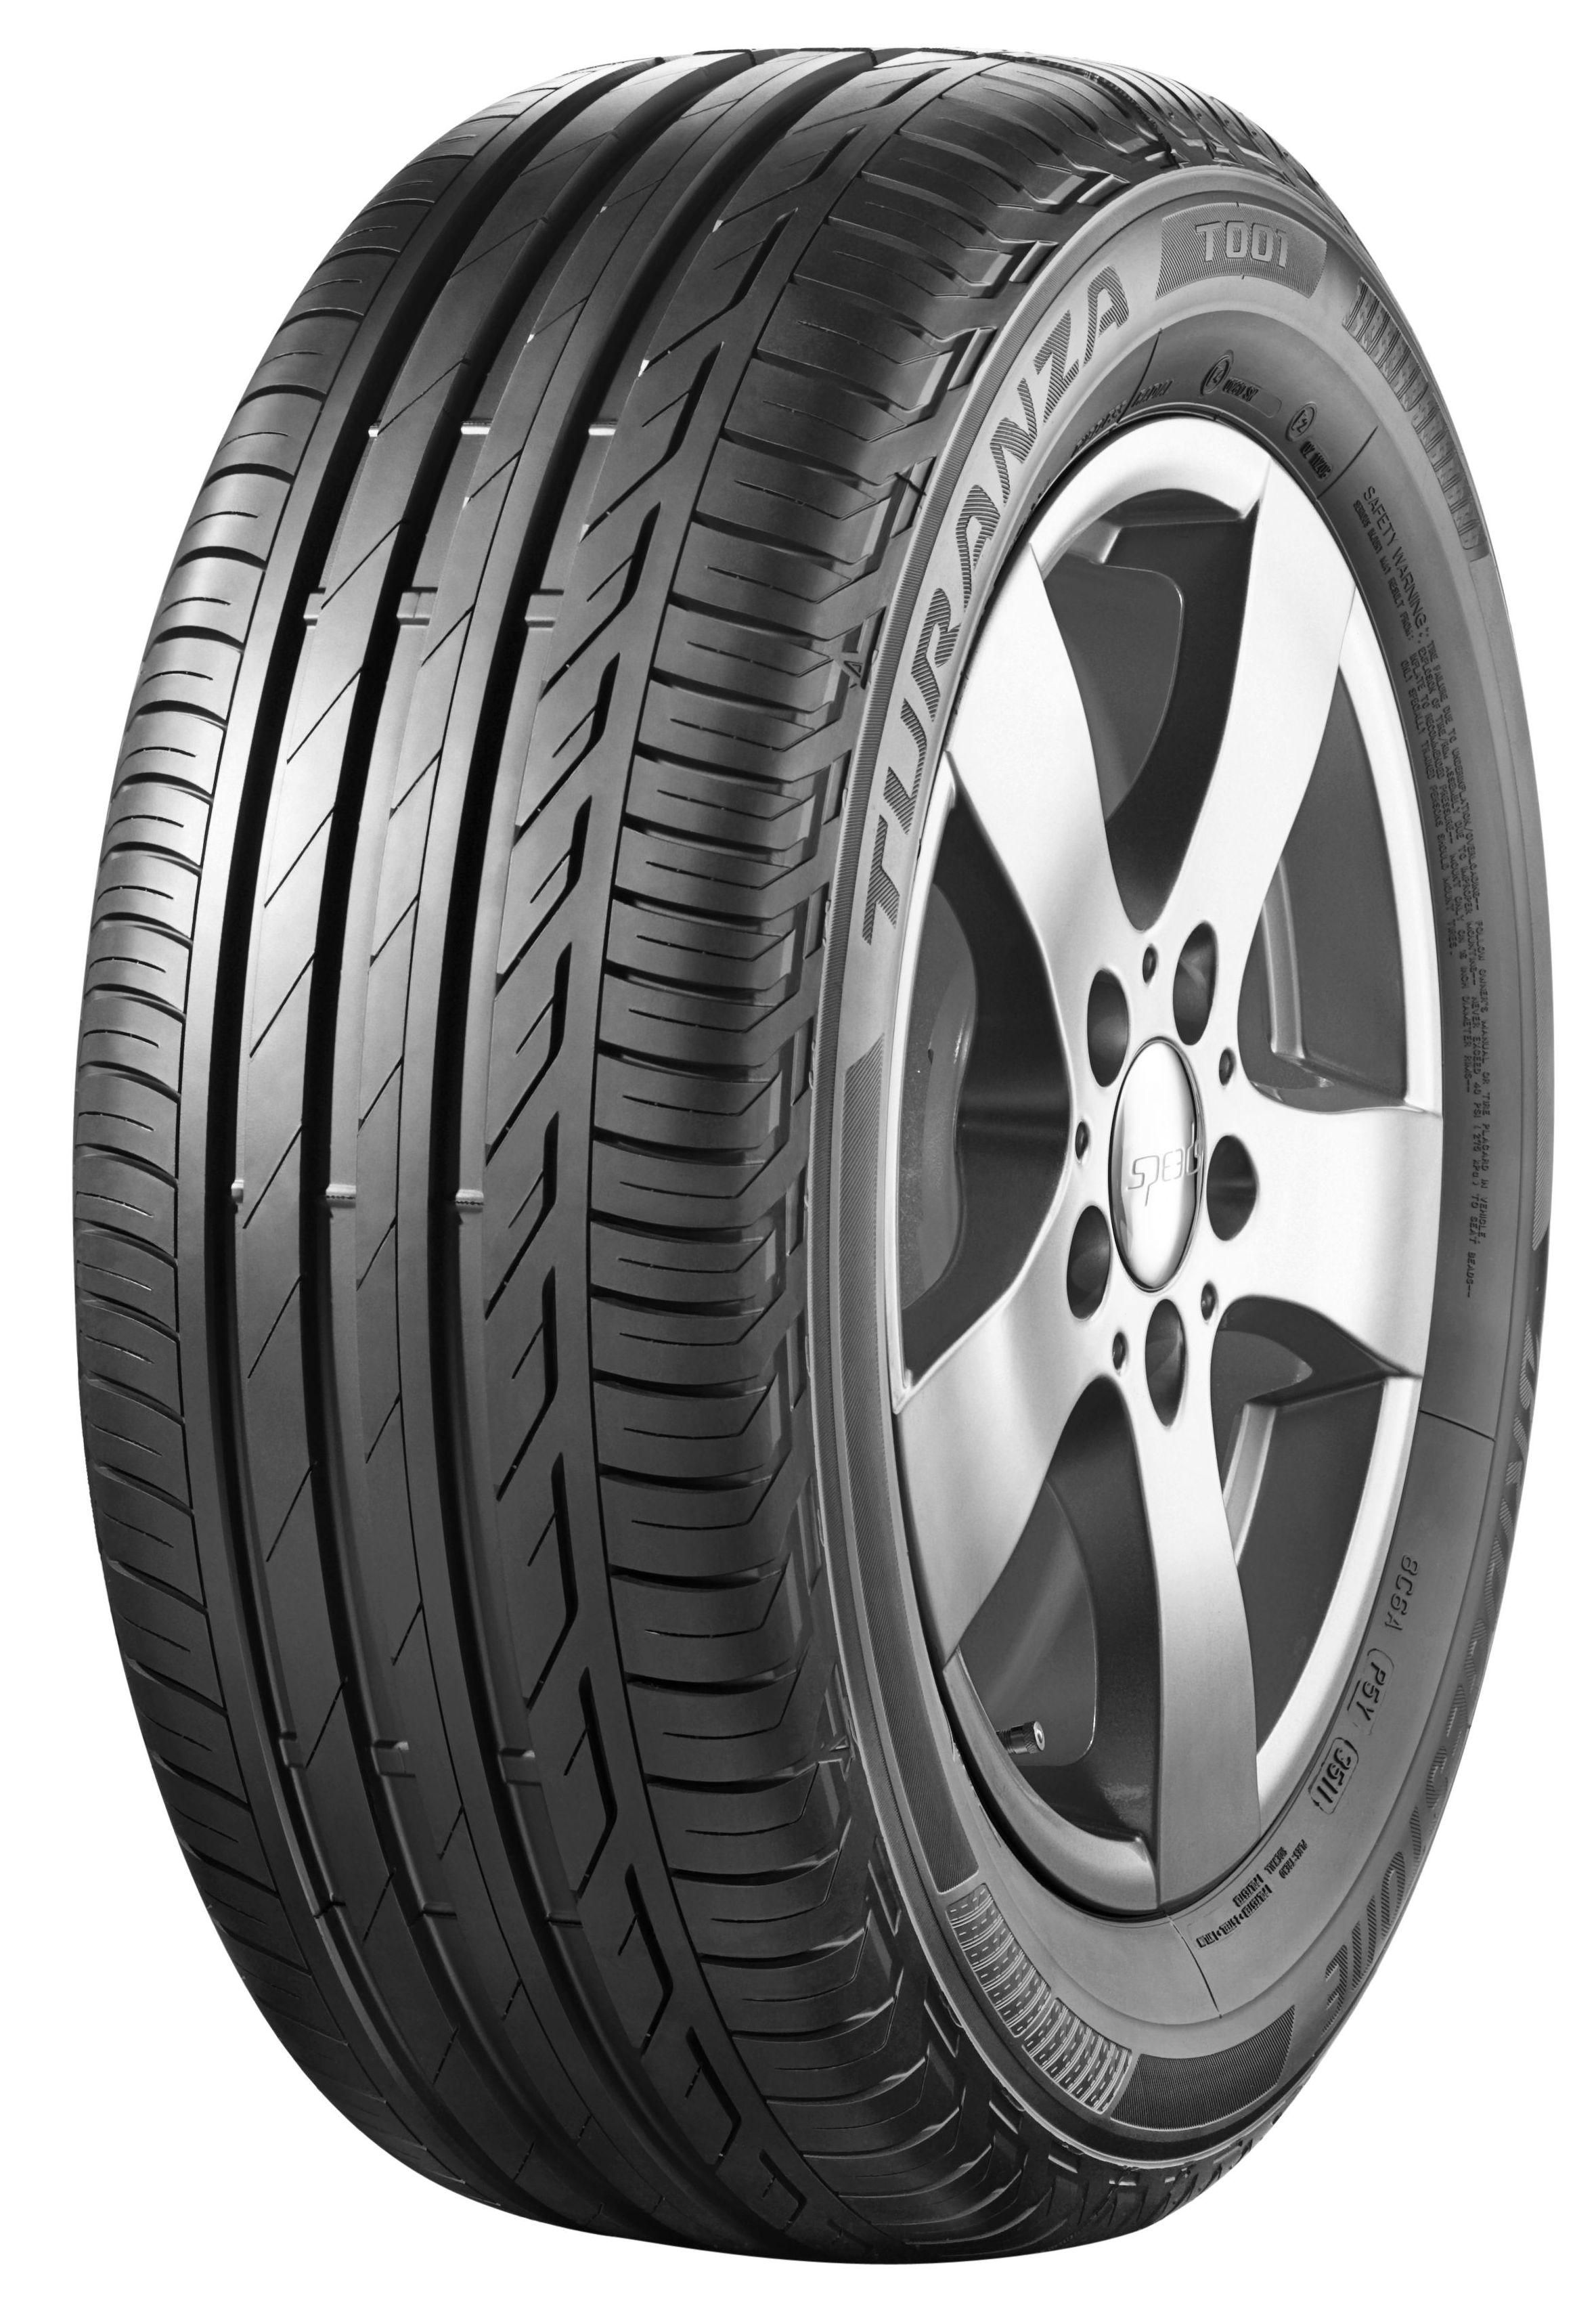 Bridgestone Turanza T001 Evo 215/60 R 16 99V letní